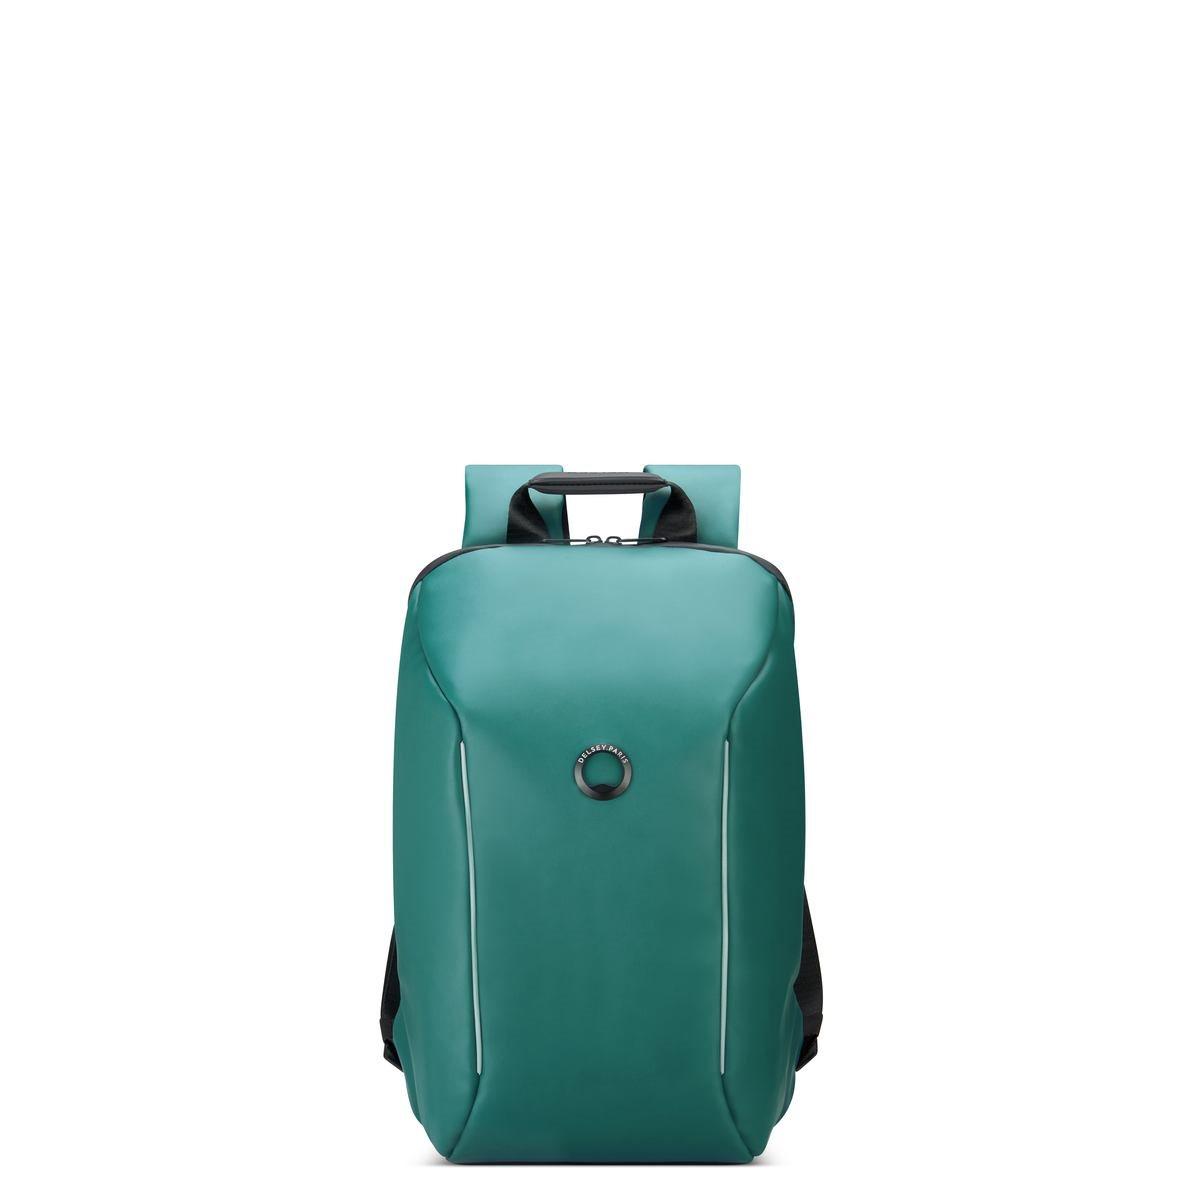 Delsey Σακίδιο πλάτης με θέση PC 14  44,5x29,5x16,5cm σειρά Securain Πράσινο